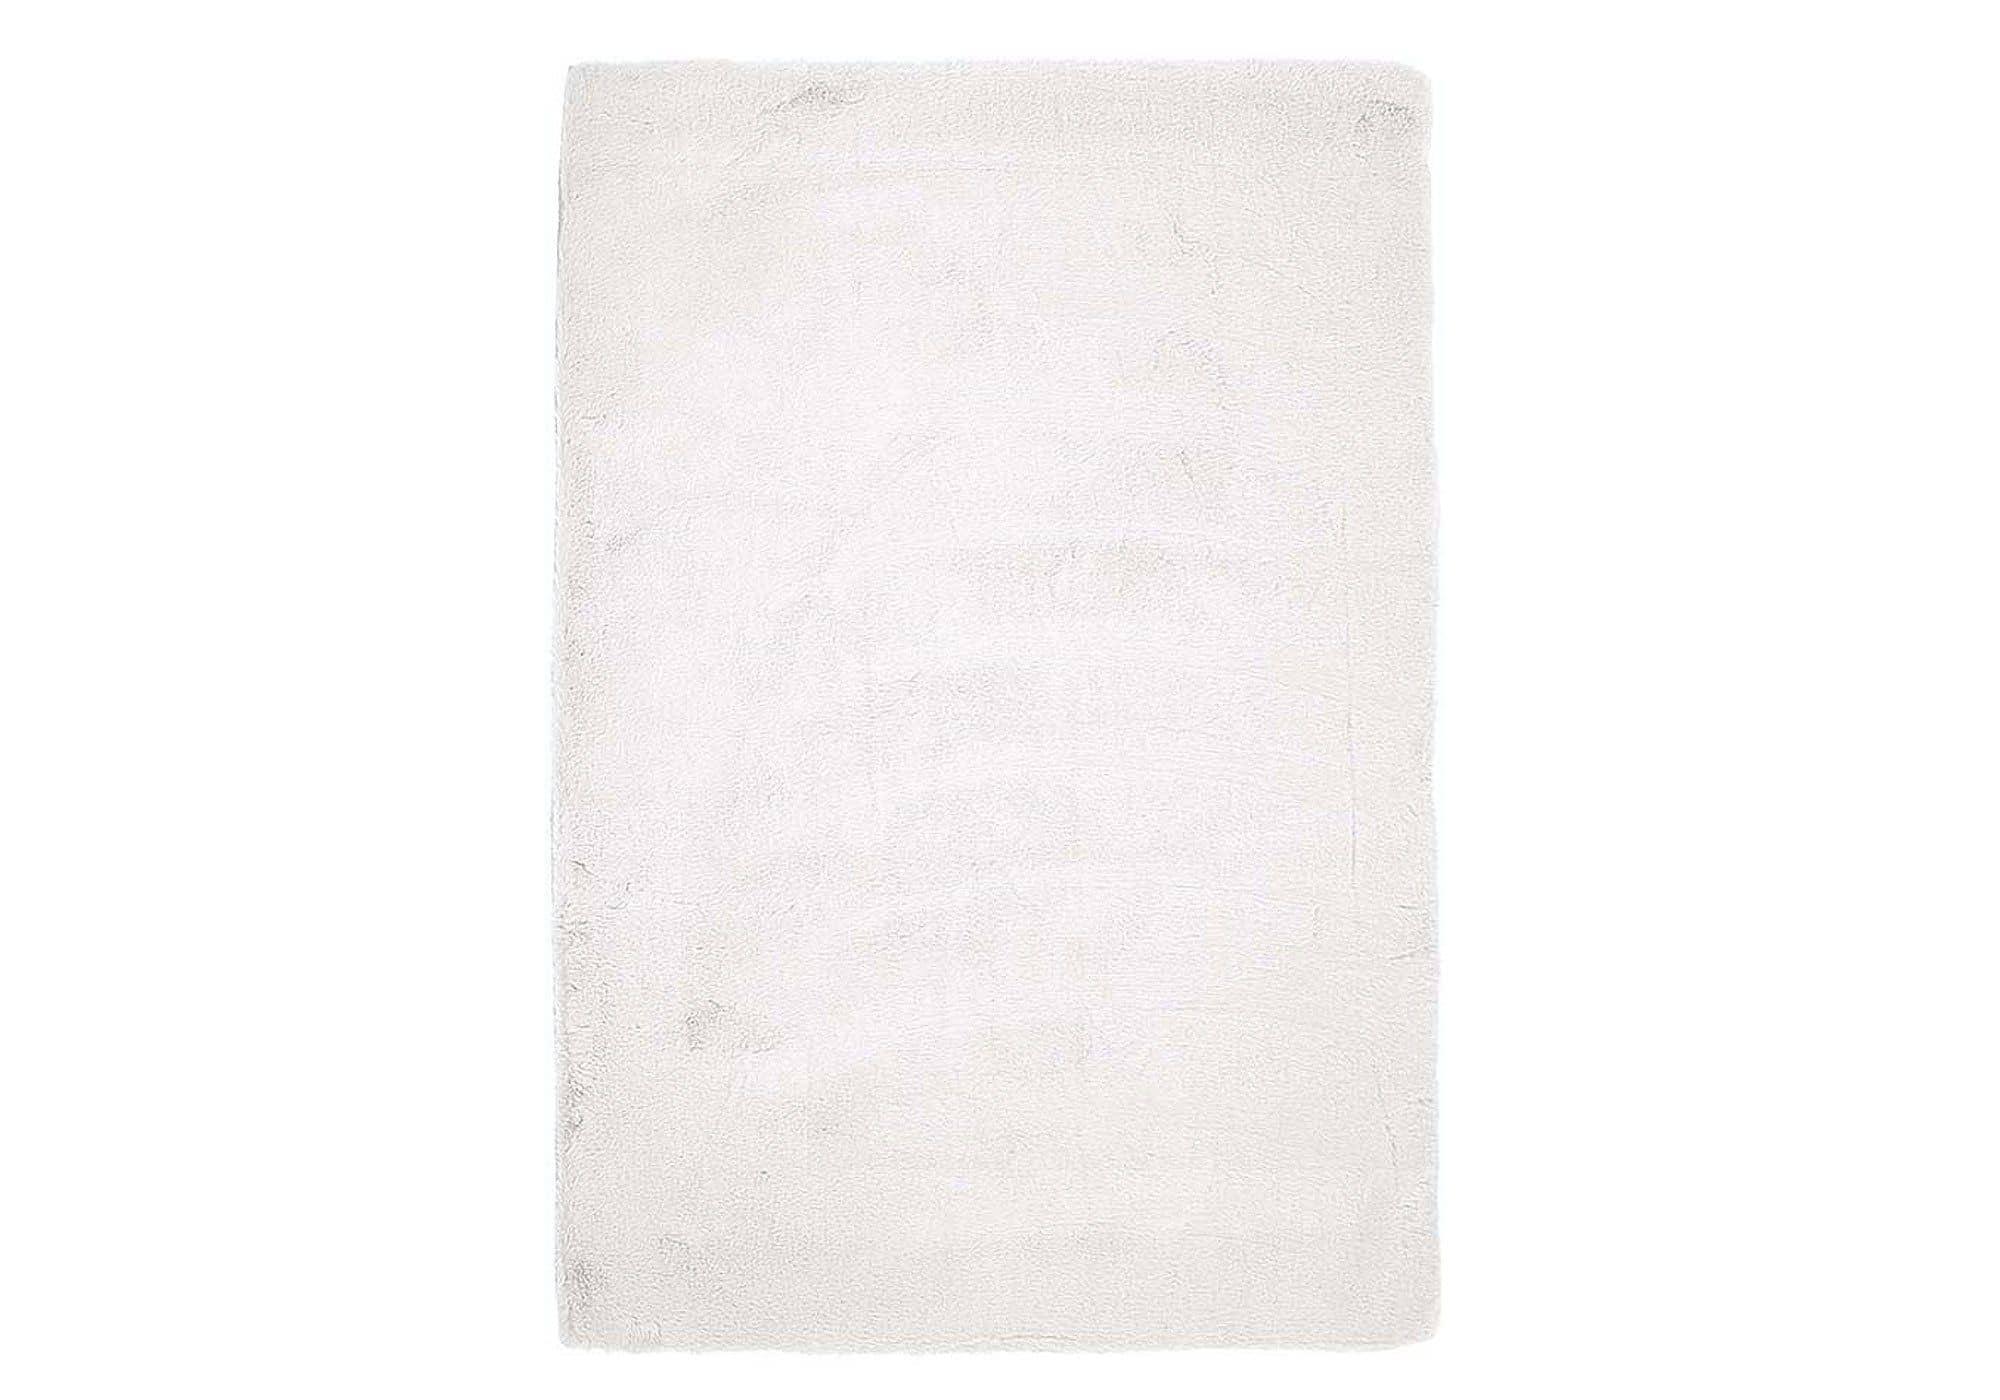 Hochflor-Teppich natur 160 x 230 cm - Soft Touch 900